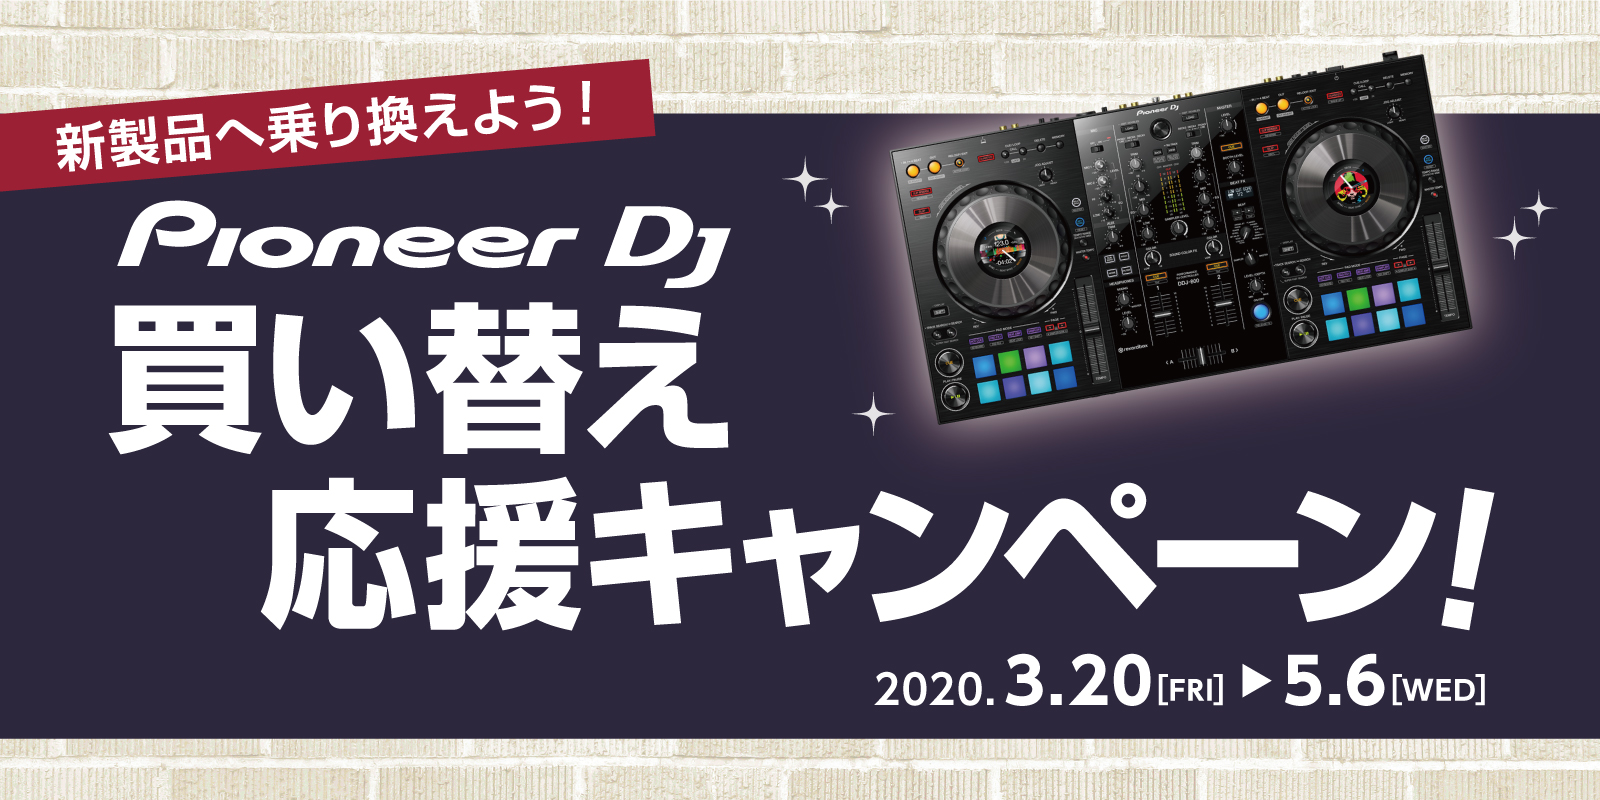 Pioneer DJ 機材を高価下取キャンペーン